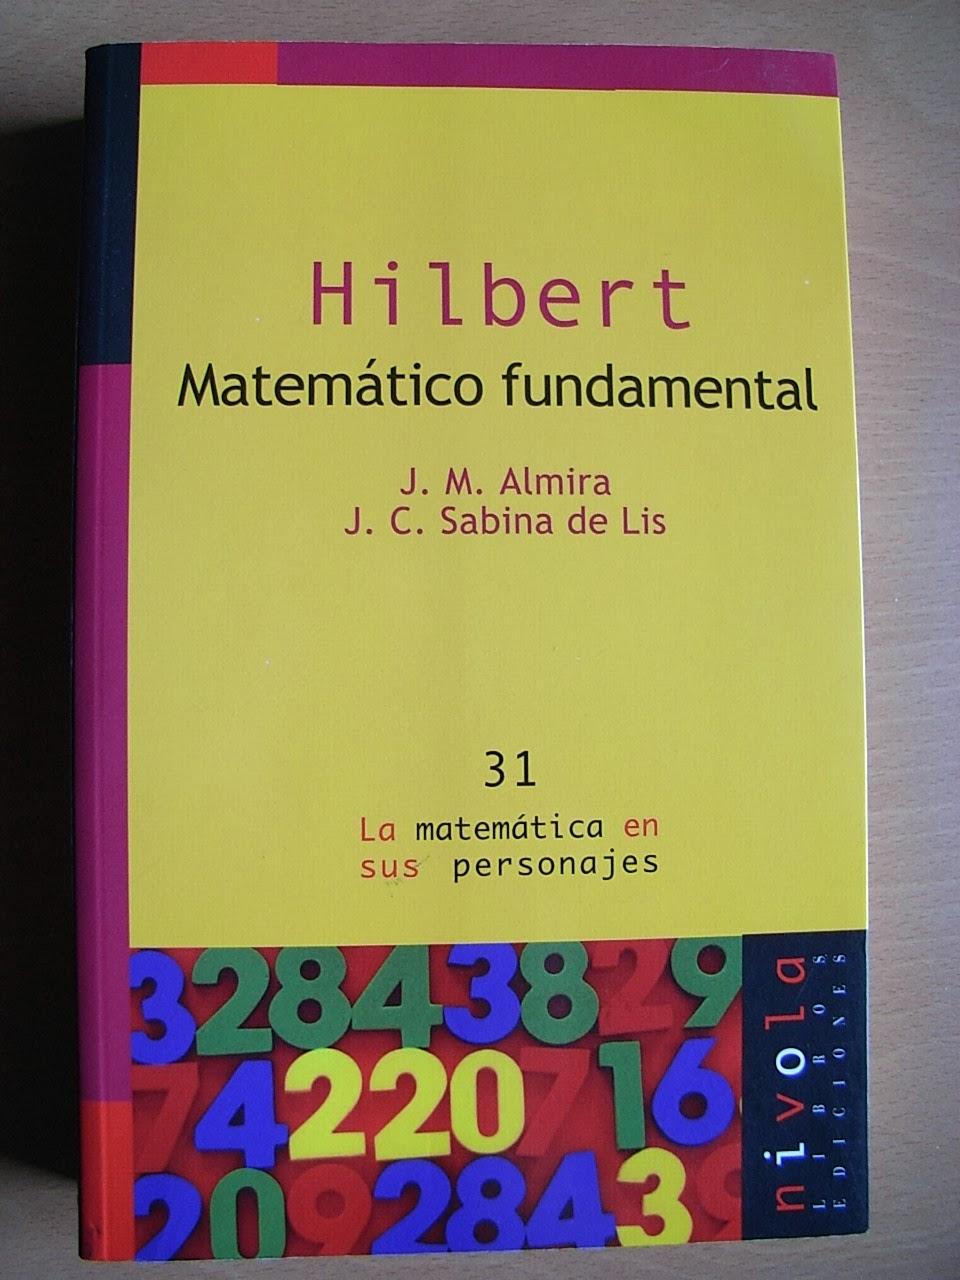 jarban02_pic042: Hilbert. Matemático fundamental de J.M. Almira y J.C. Sabina de Lis